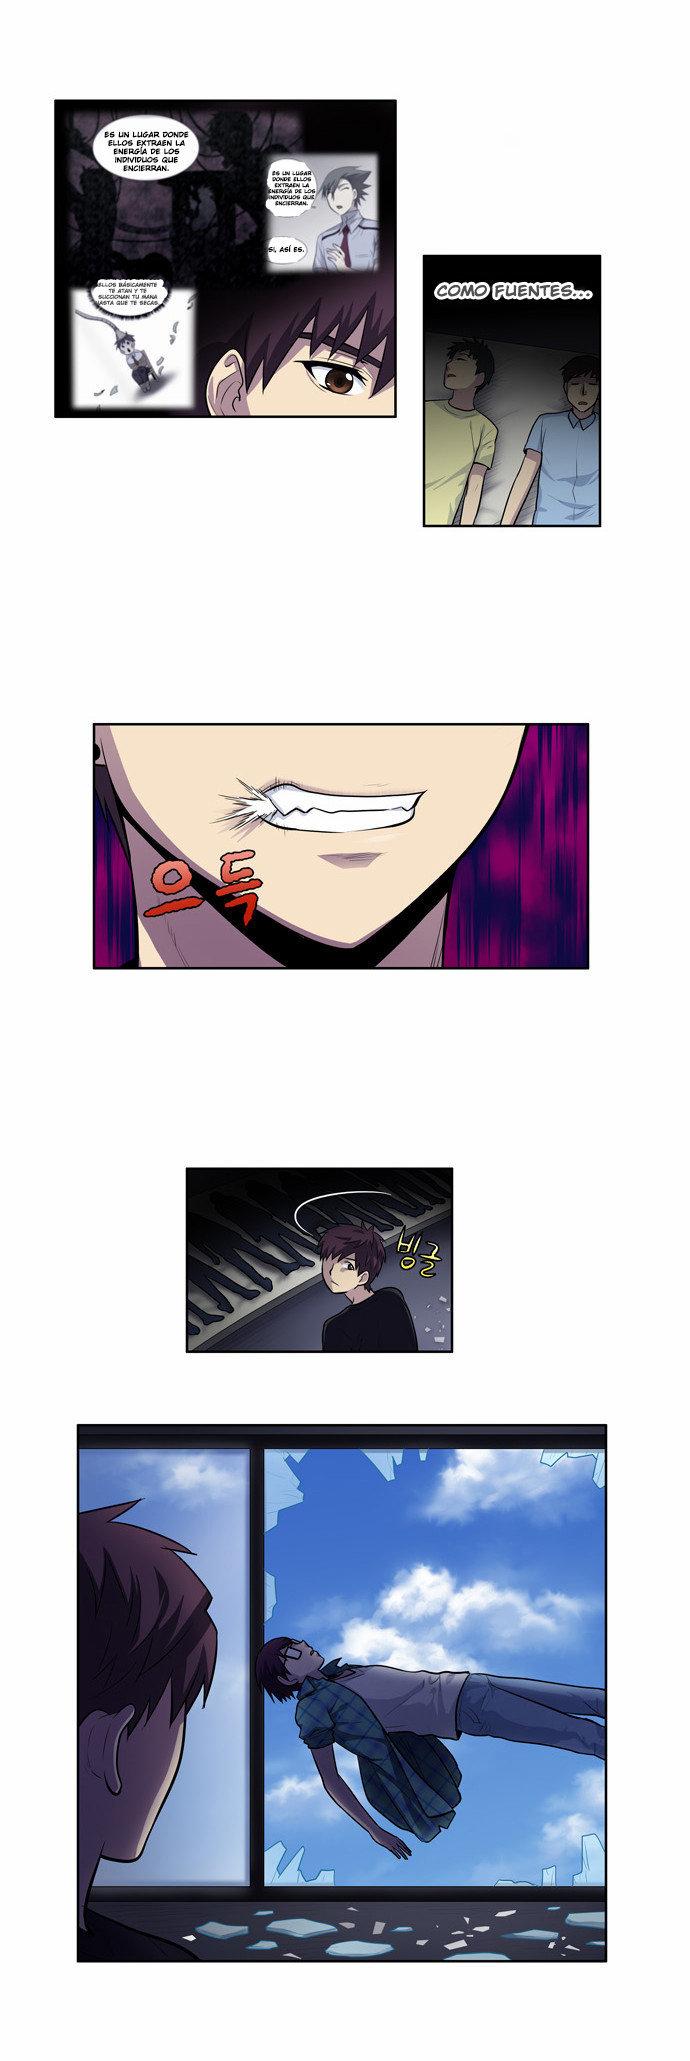 http://c5.ninemanga.com/es_manga/61/1725/442818/bb5a9482a2dfd06d2e68299a8cabdf31.jpg Page 15